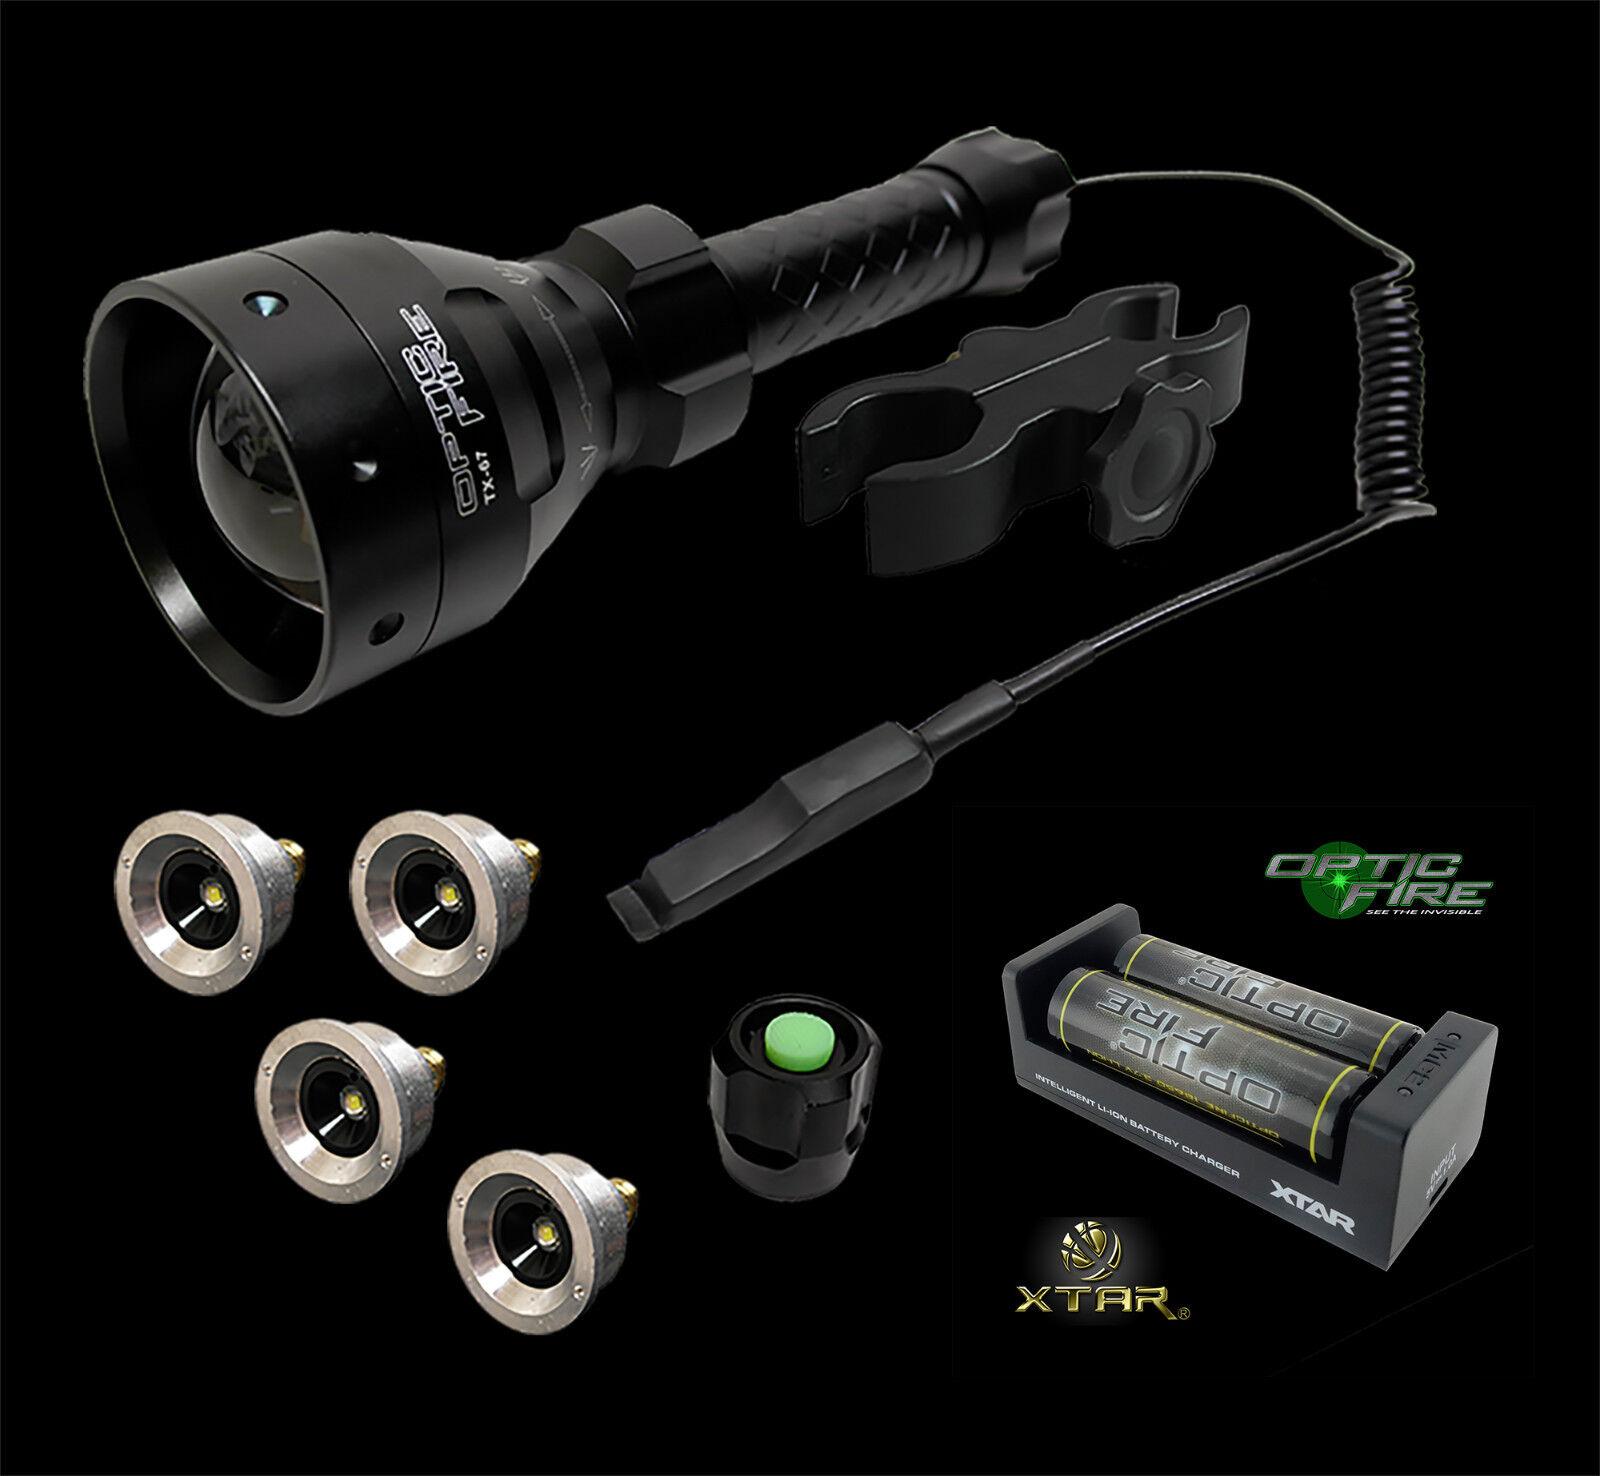 Opticfire ® TX-67 T67 led deluxe/suprême portée lamping kit chasse chasse chasse torche nv lampe dc1b93